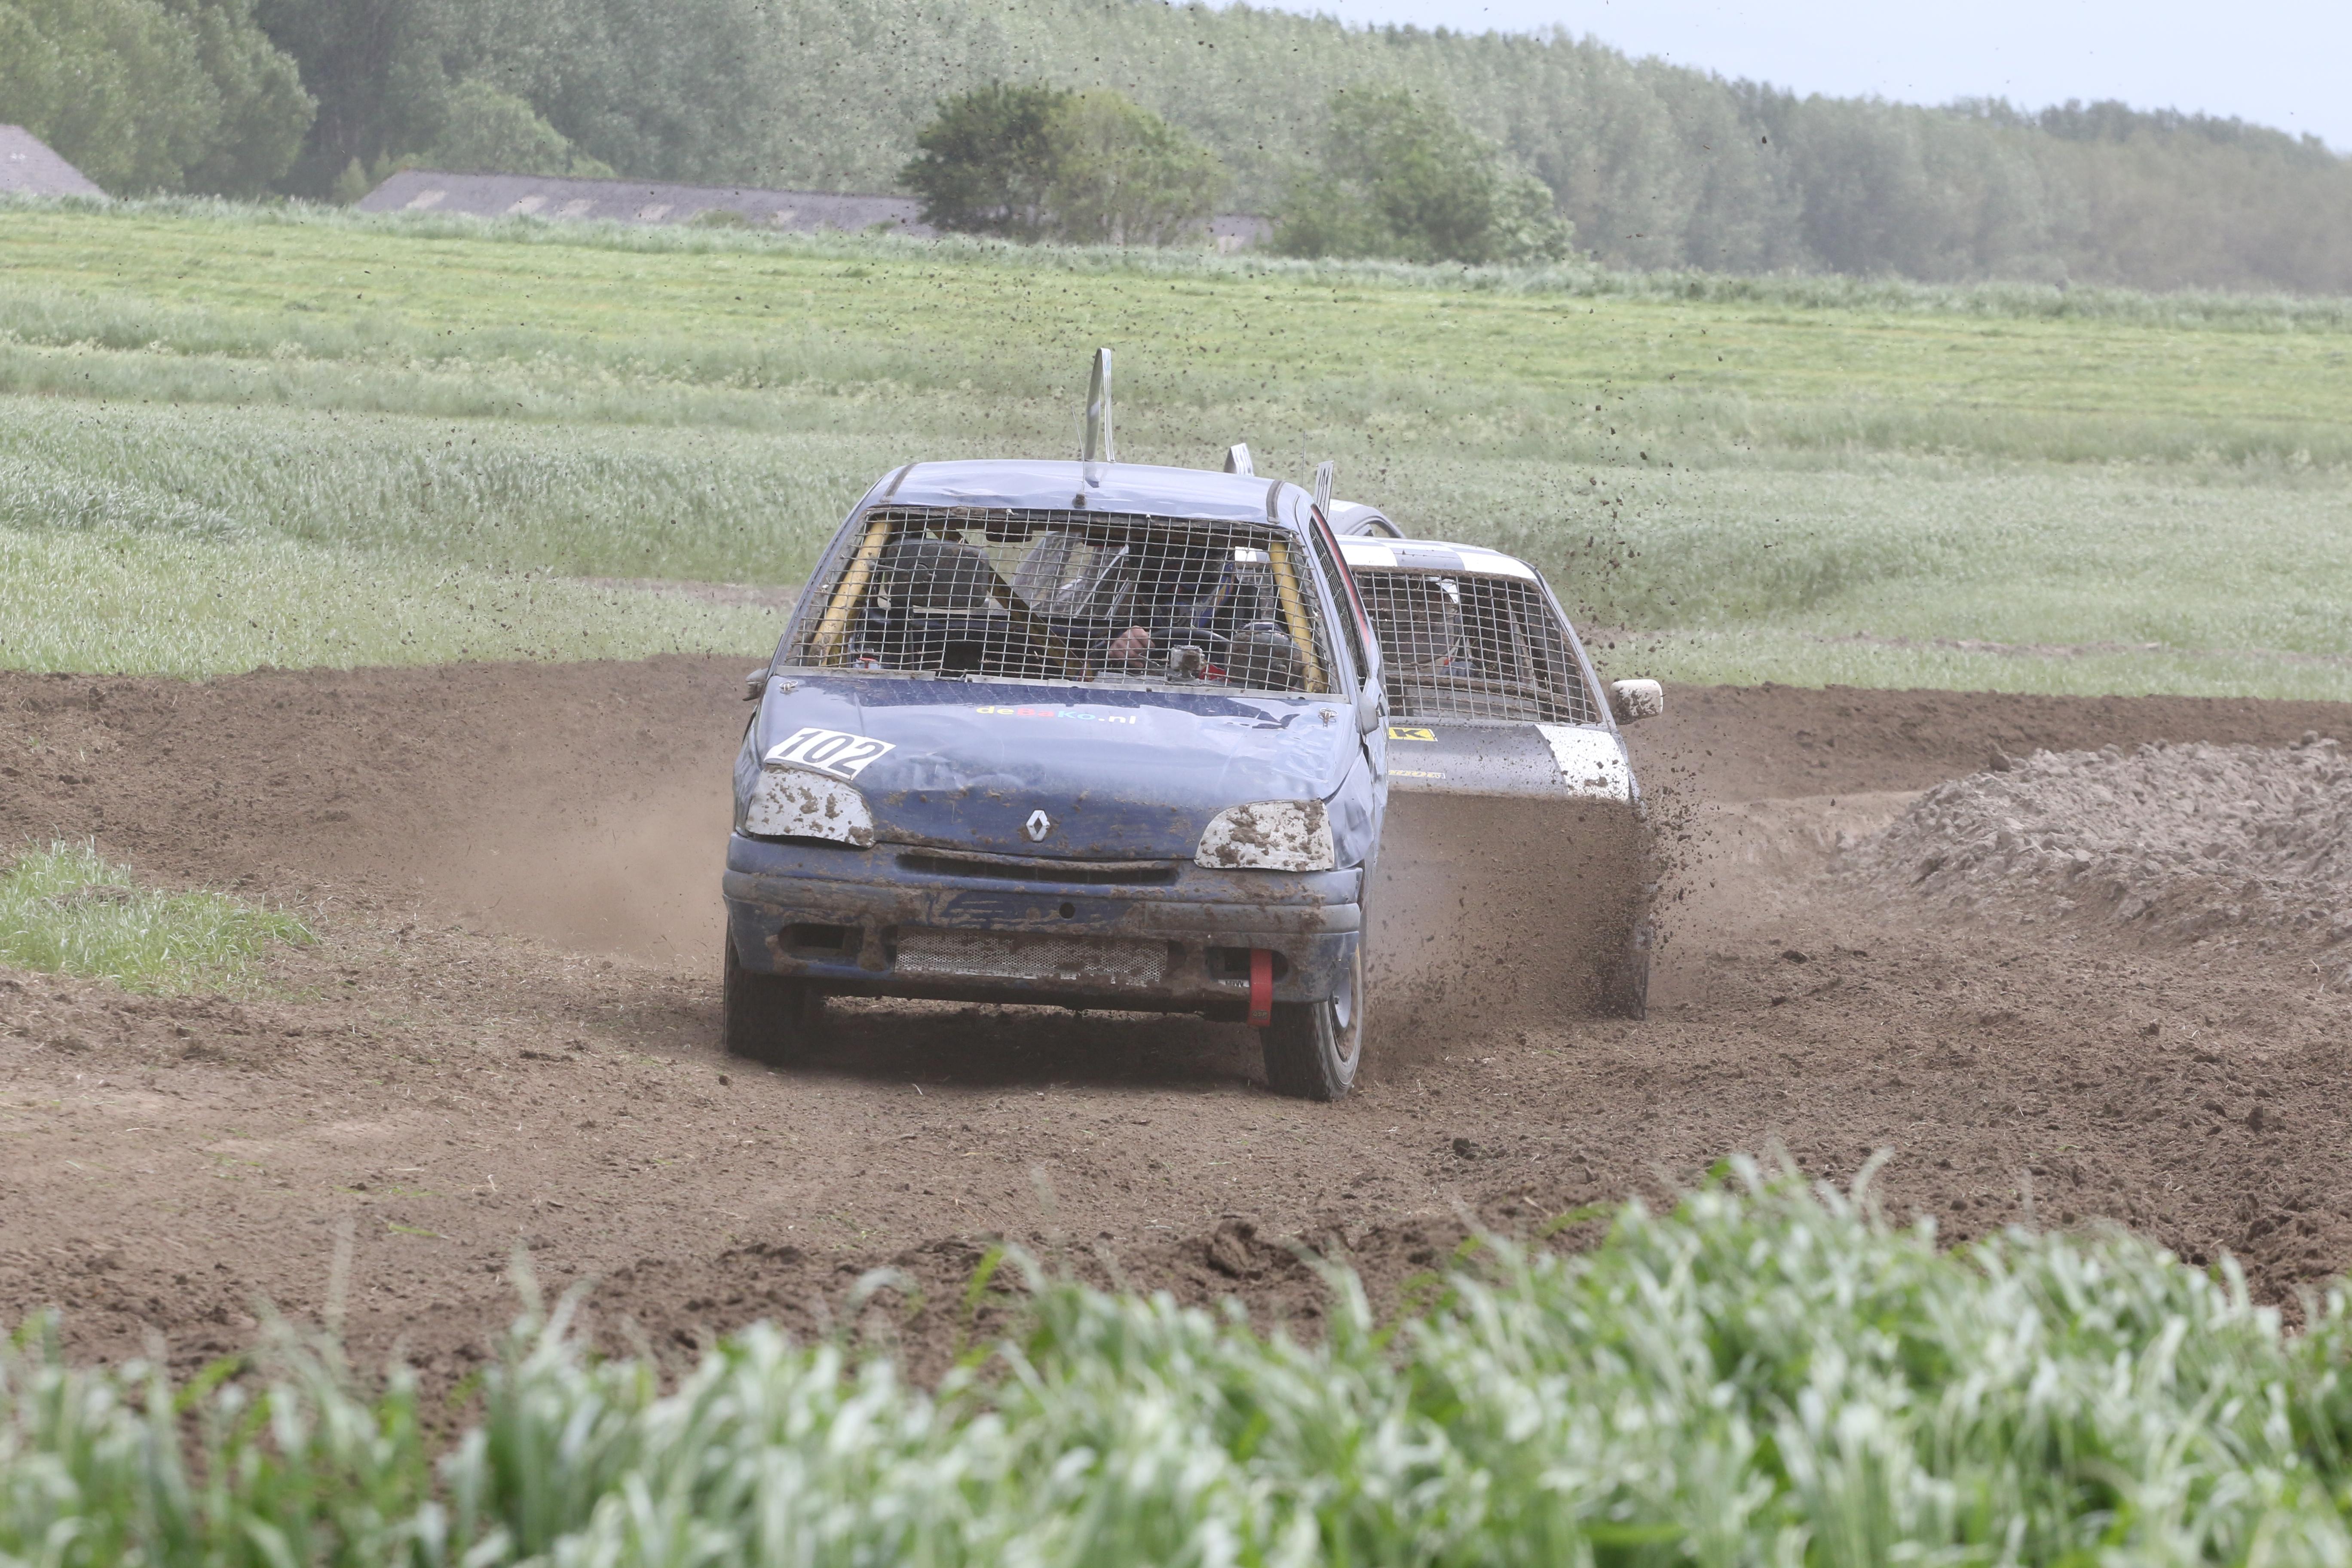 autocross sluiskil 14-5-2016 267